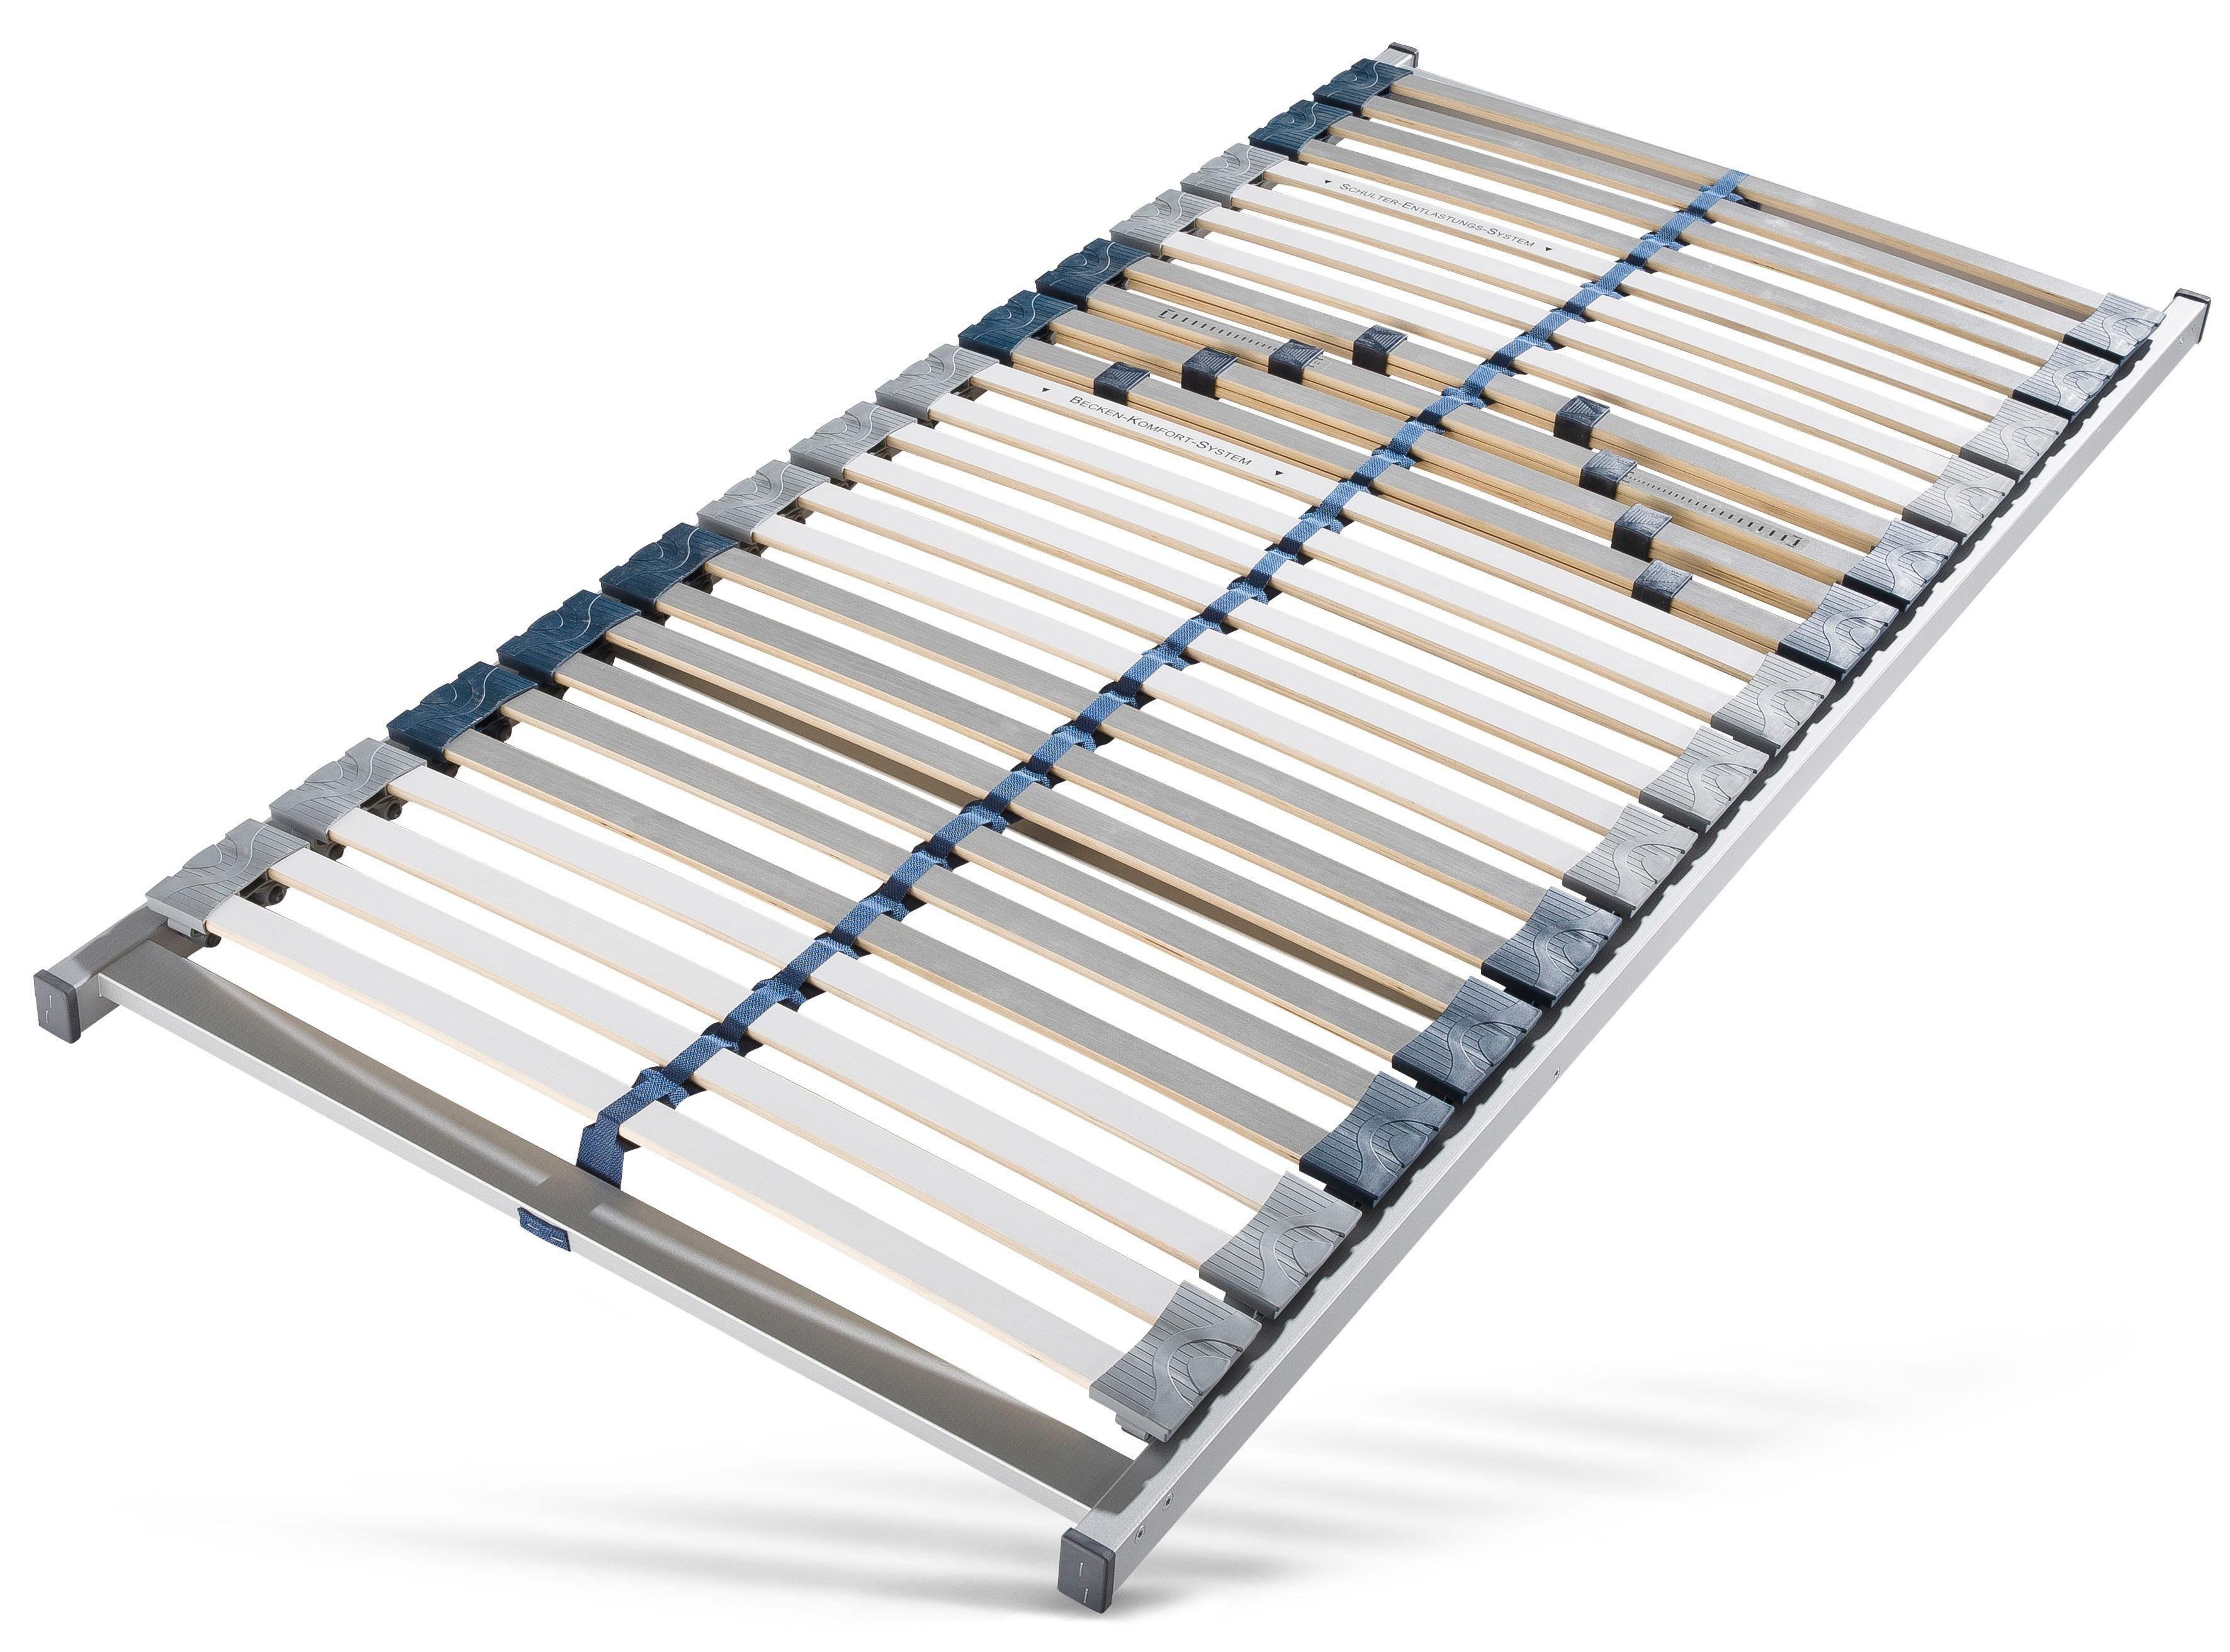 Lattenrost Perfekta 200 Beco Kopfteil nicht verstellbar | Schlafzimmer > Lattenroste > Unverstellbare Lattenroste | Beco